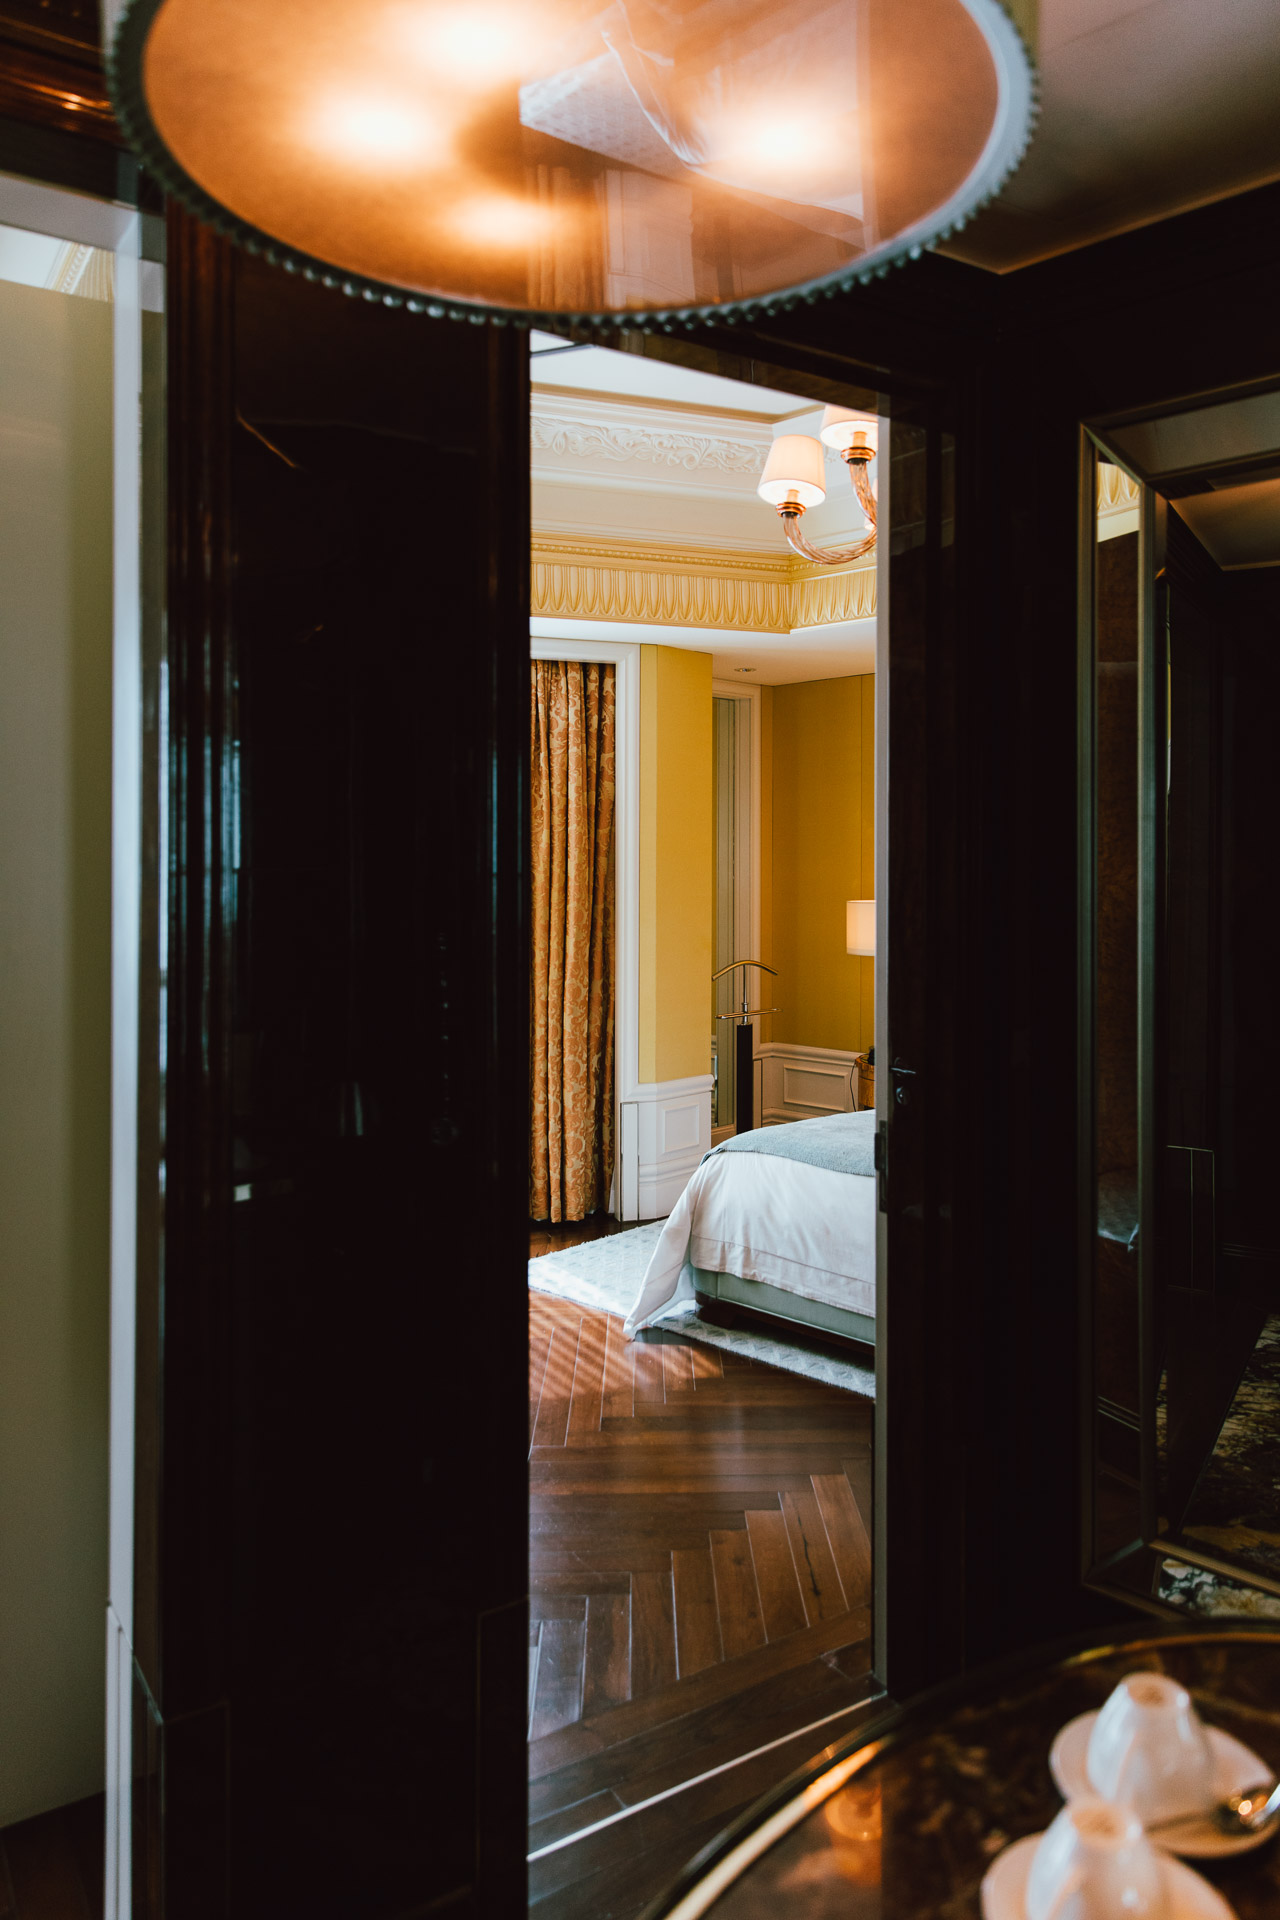 st-regis-singapore-marriott-luxury-hotel-photographer-15.jpg